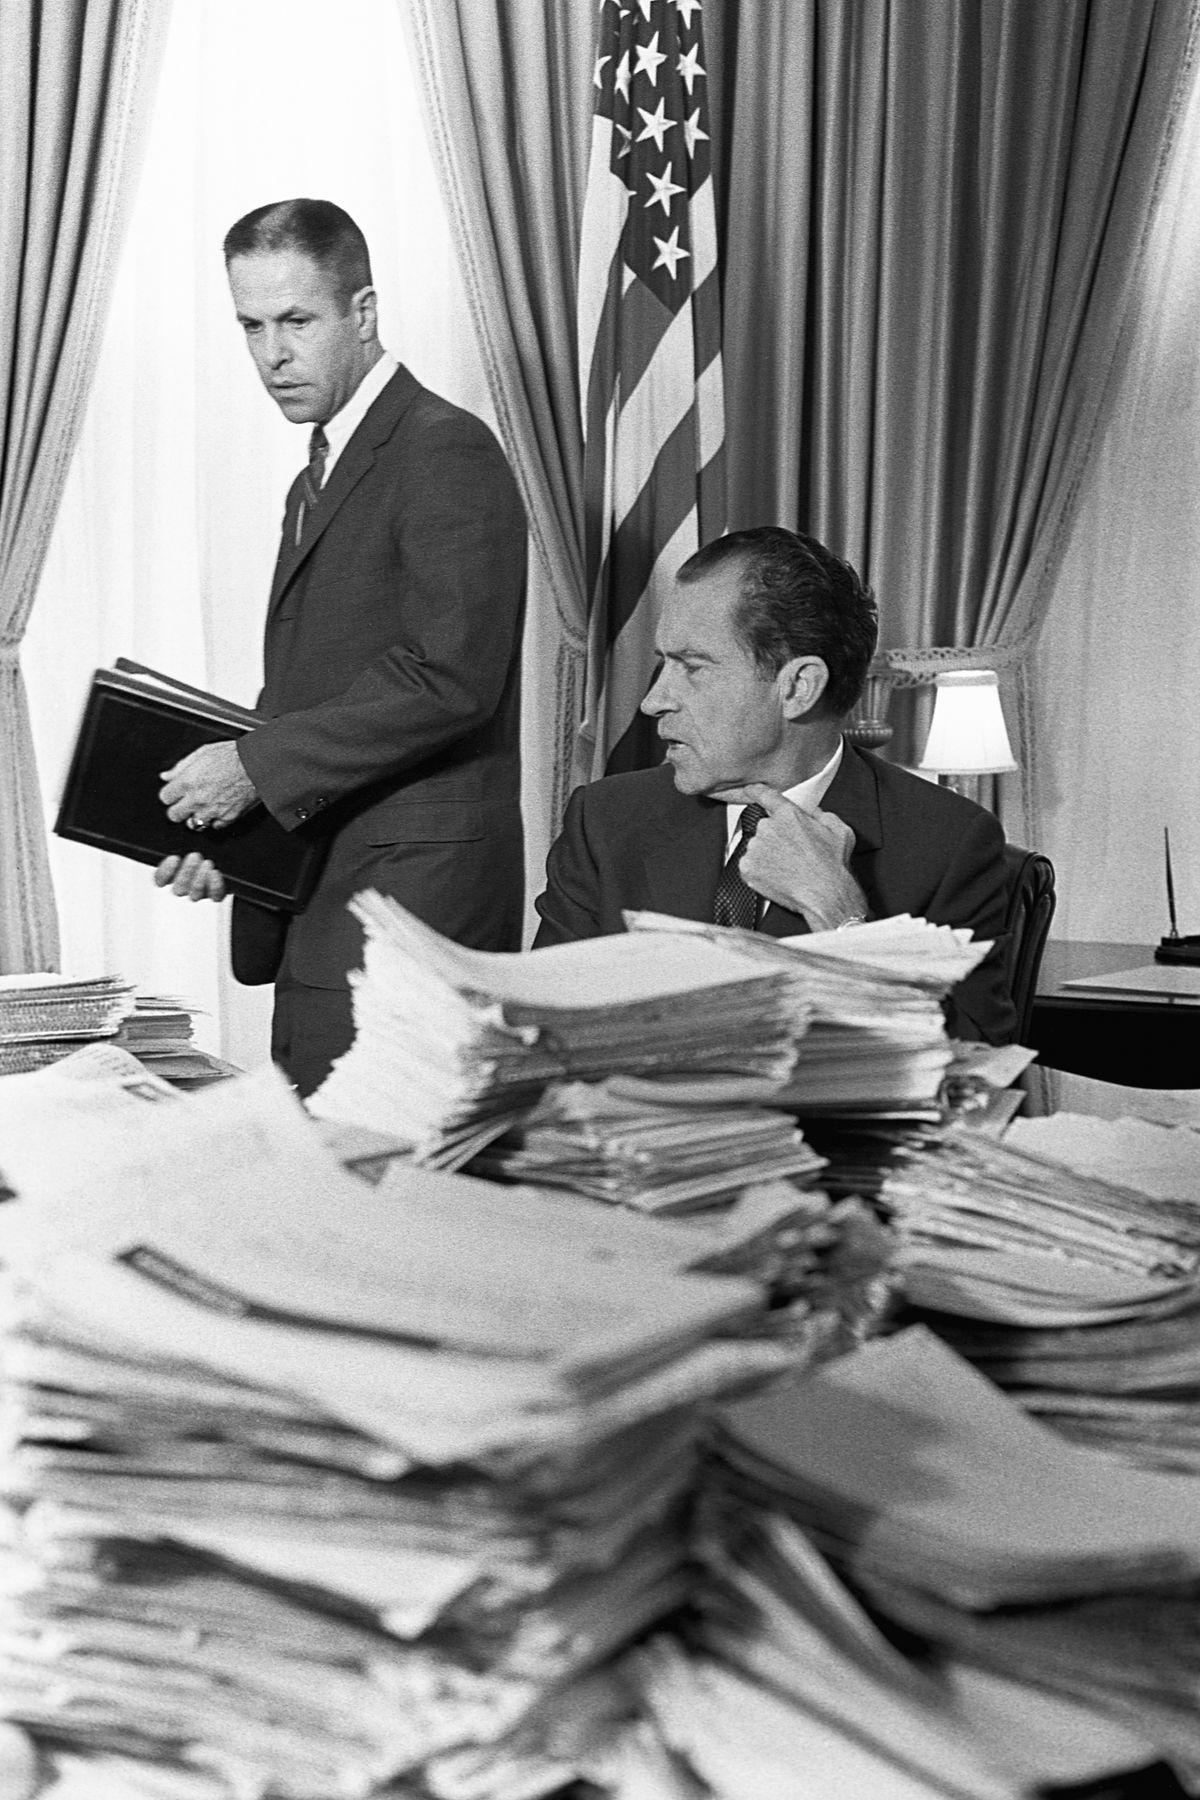 President Richard M. Nixon speaks with his chief of staff, H.R. Haldeman.